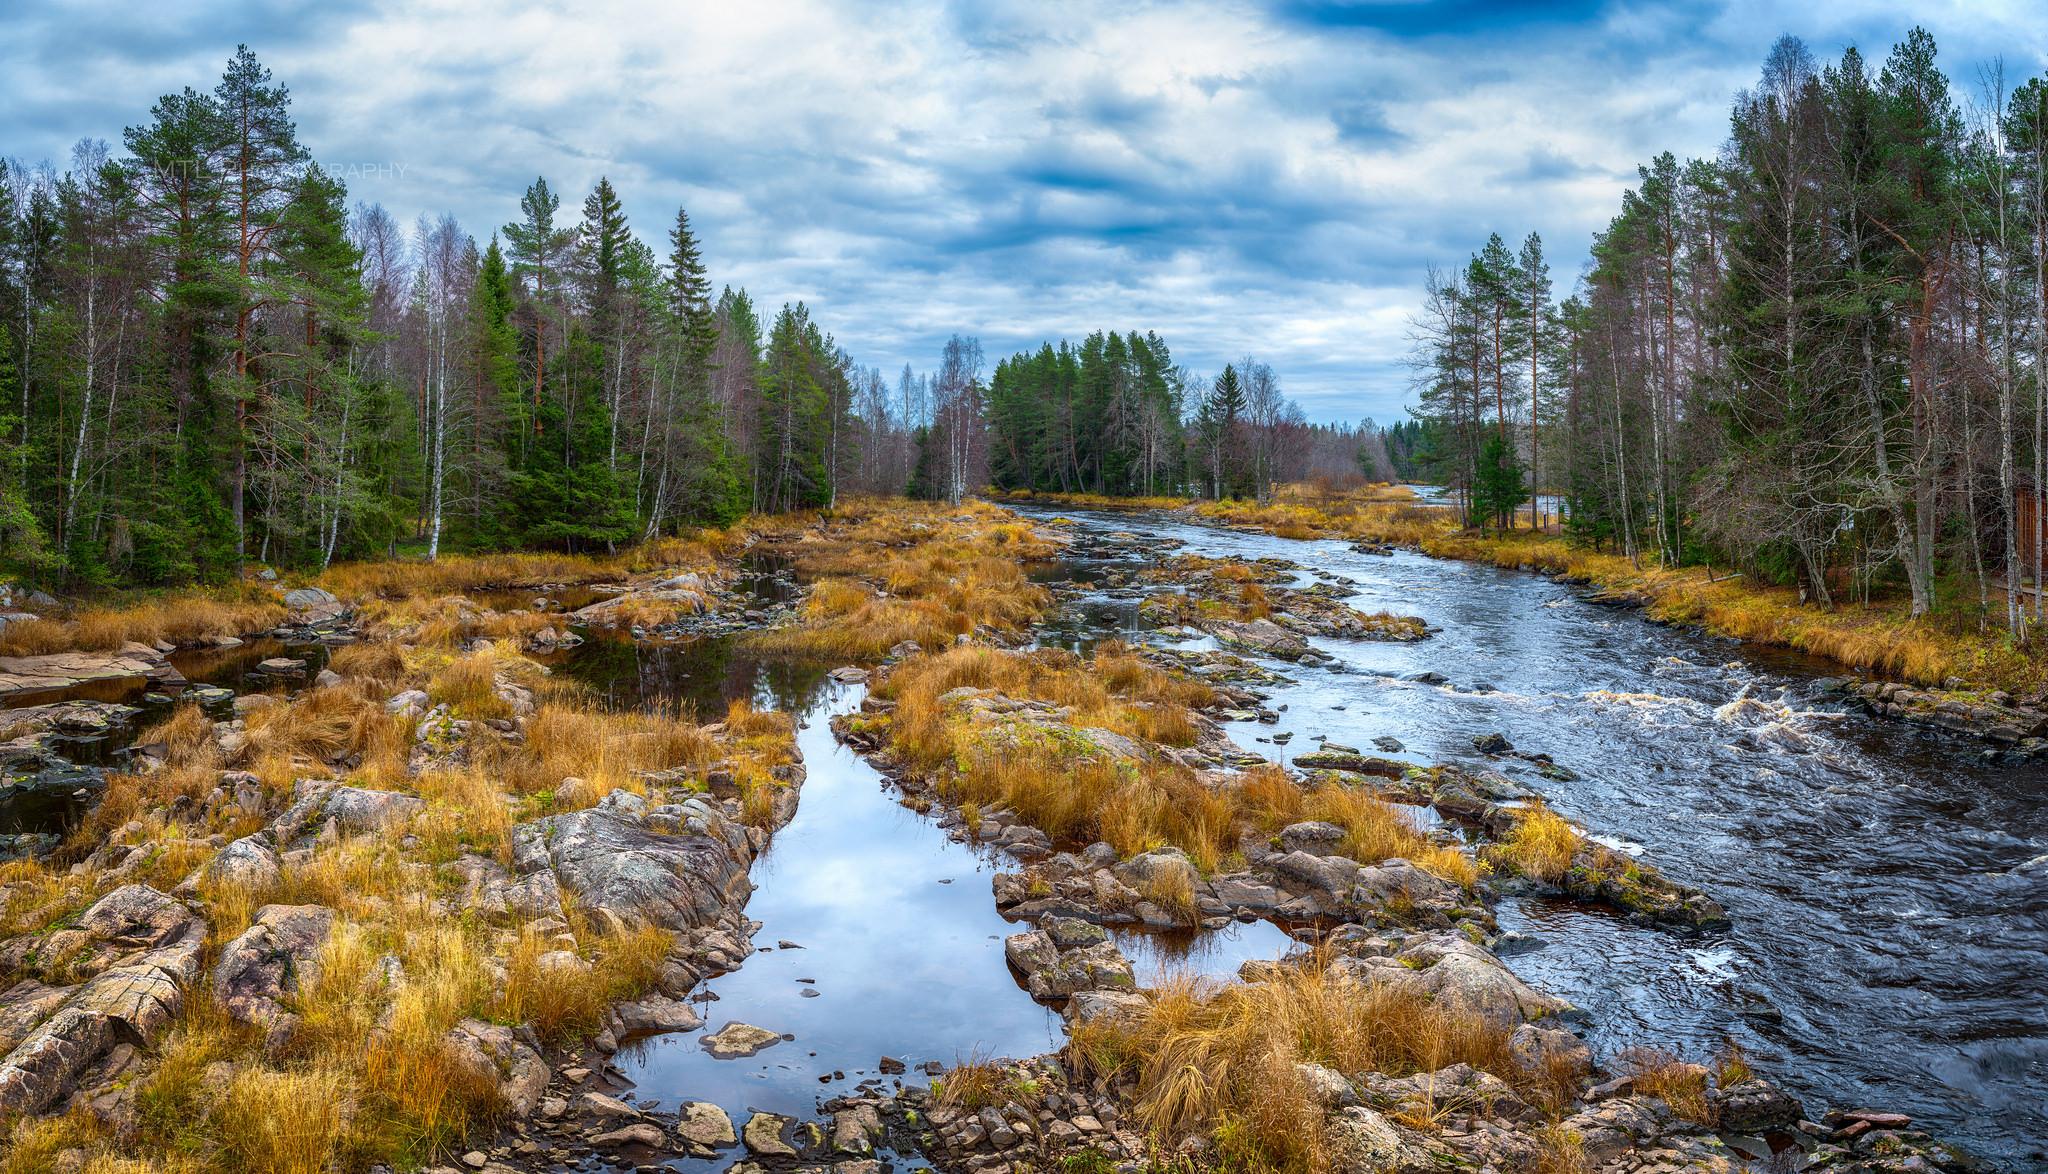 обои Kiiminkijoki Riverг, река Кииминкийоке, деревья, Finland картинки фото